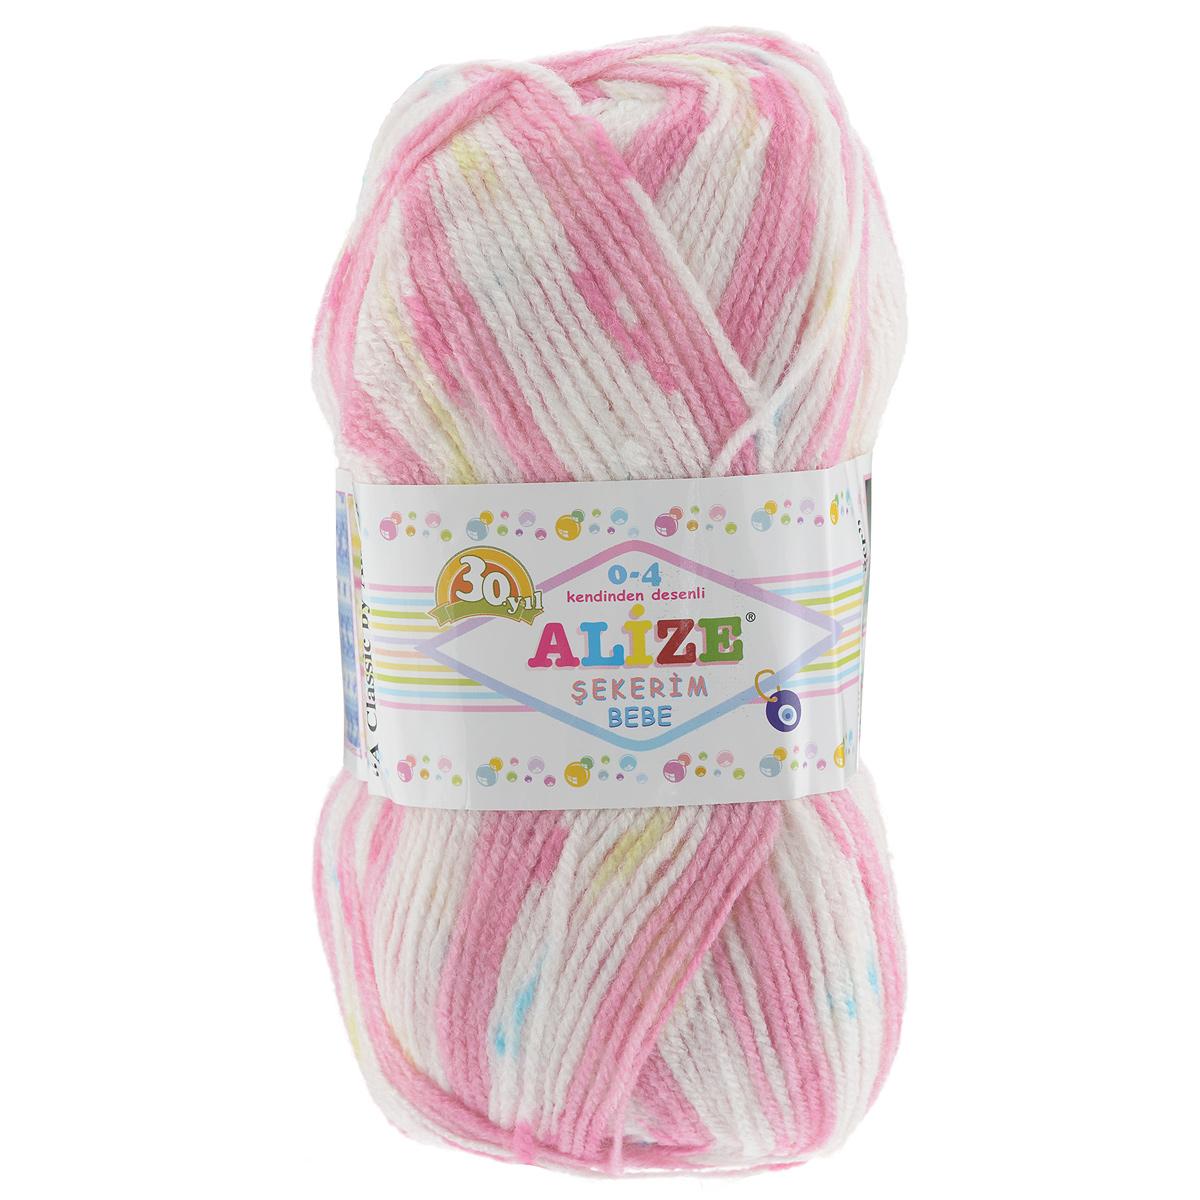 "Пряжа для вязания Alize ""Sekerim Bebe"", цвет: розовый, белый (102), 350 м, 100 г, 5 шт"